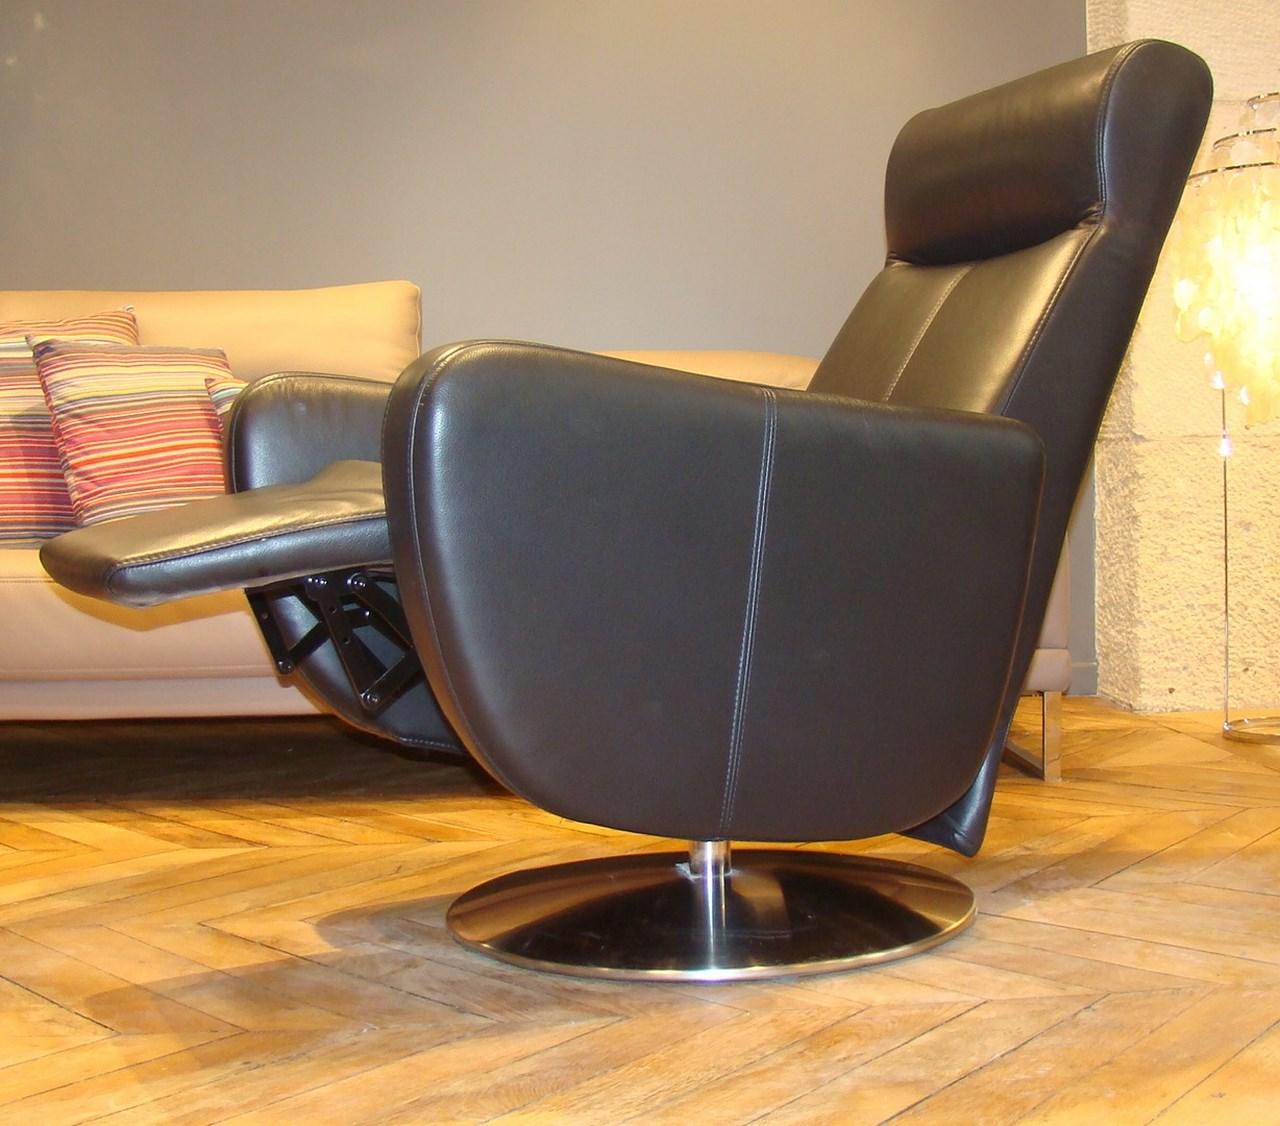 Zeus fauteuil relaxation cuir blog de seanroyale blog de seanroyale - Fauteuil relax solde ...